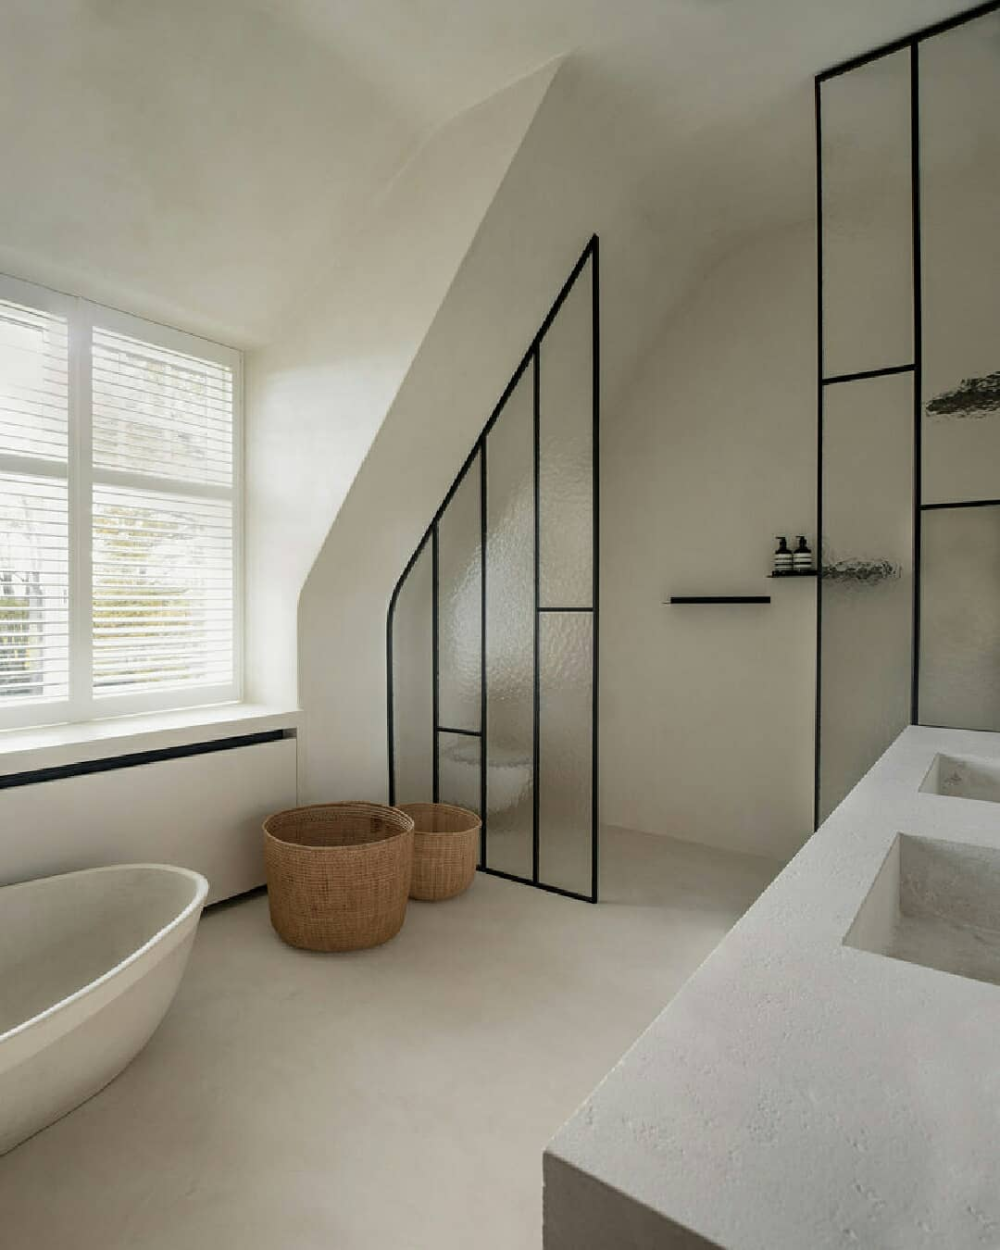 "Photo of estliving.com on Instagram: ""BATHROOM |Sint-Martens-Latem Bathroom . Belgian design office @studioloho combine their finesse for interior and product design in…"""